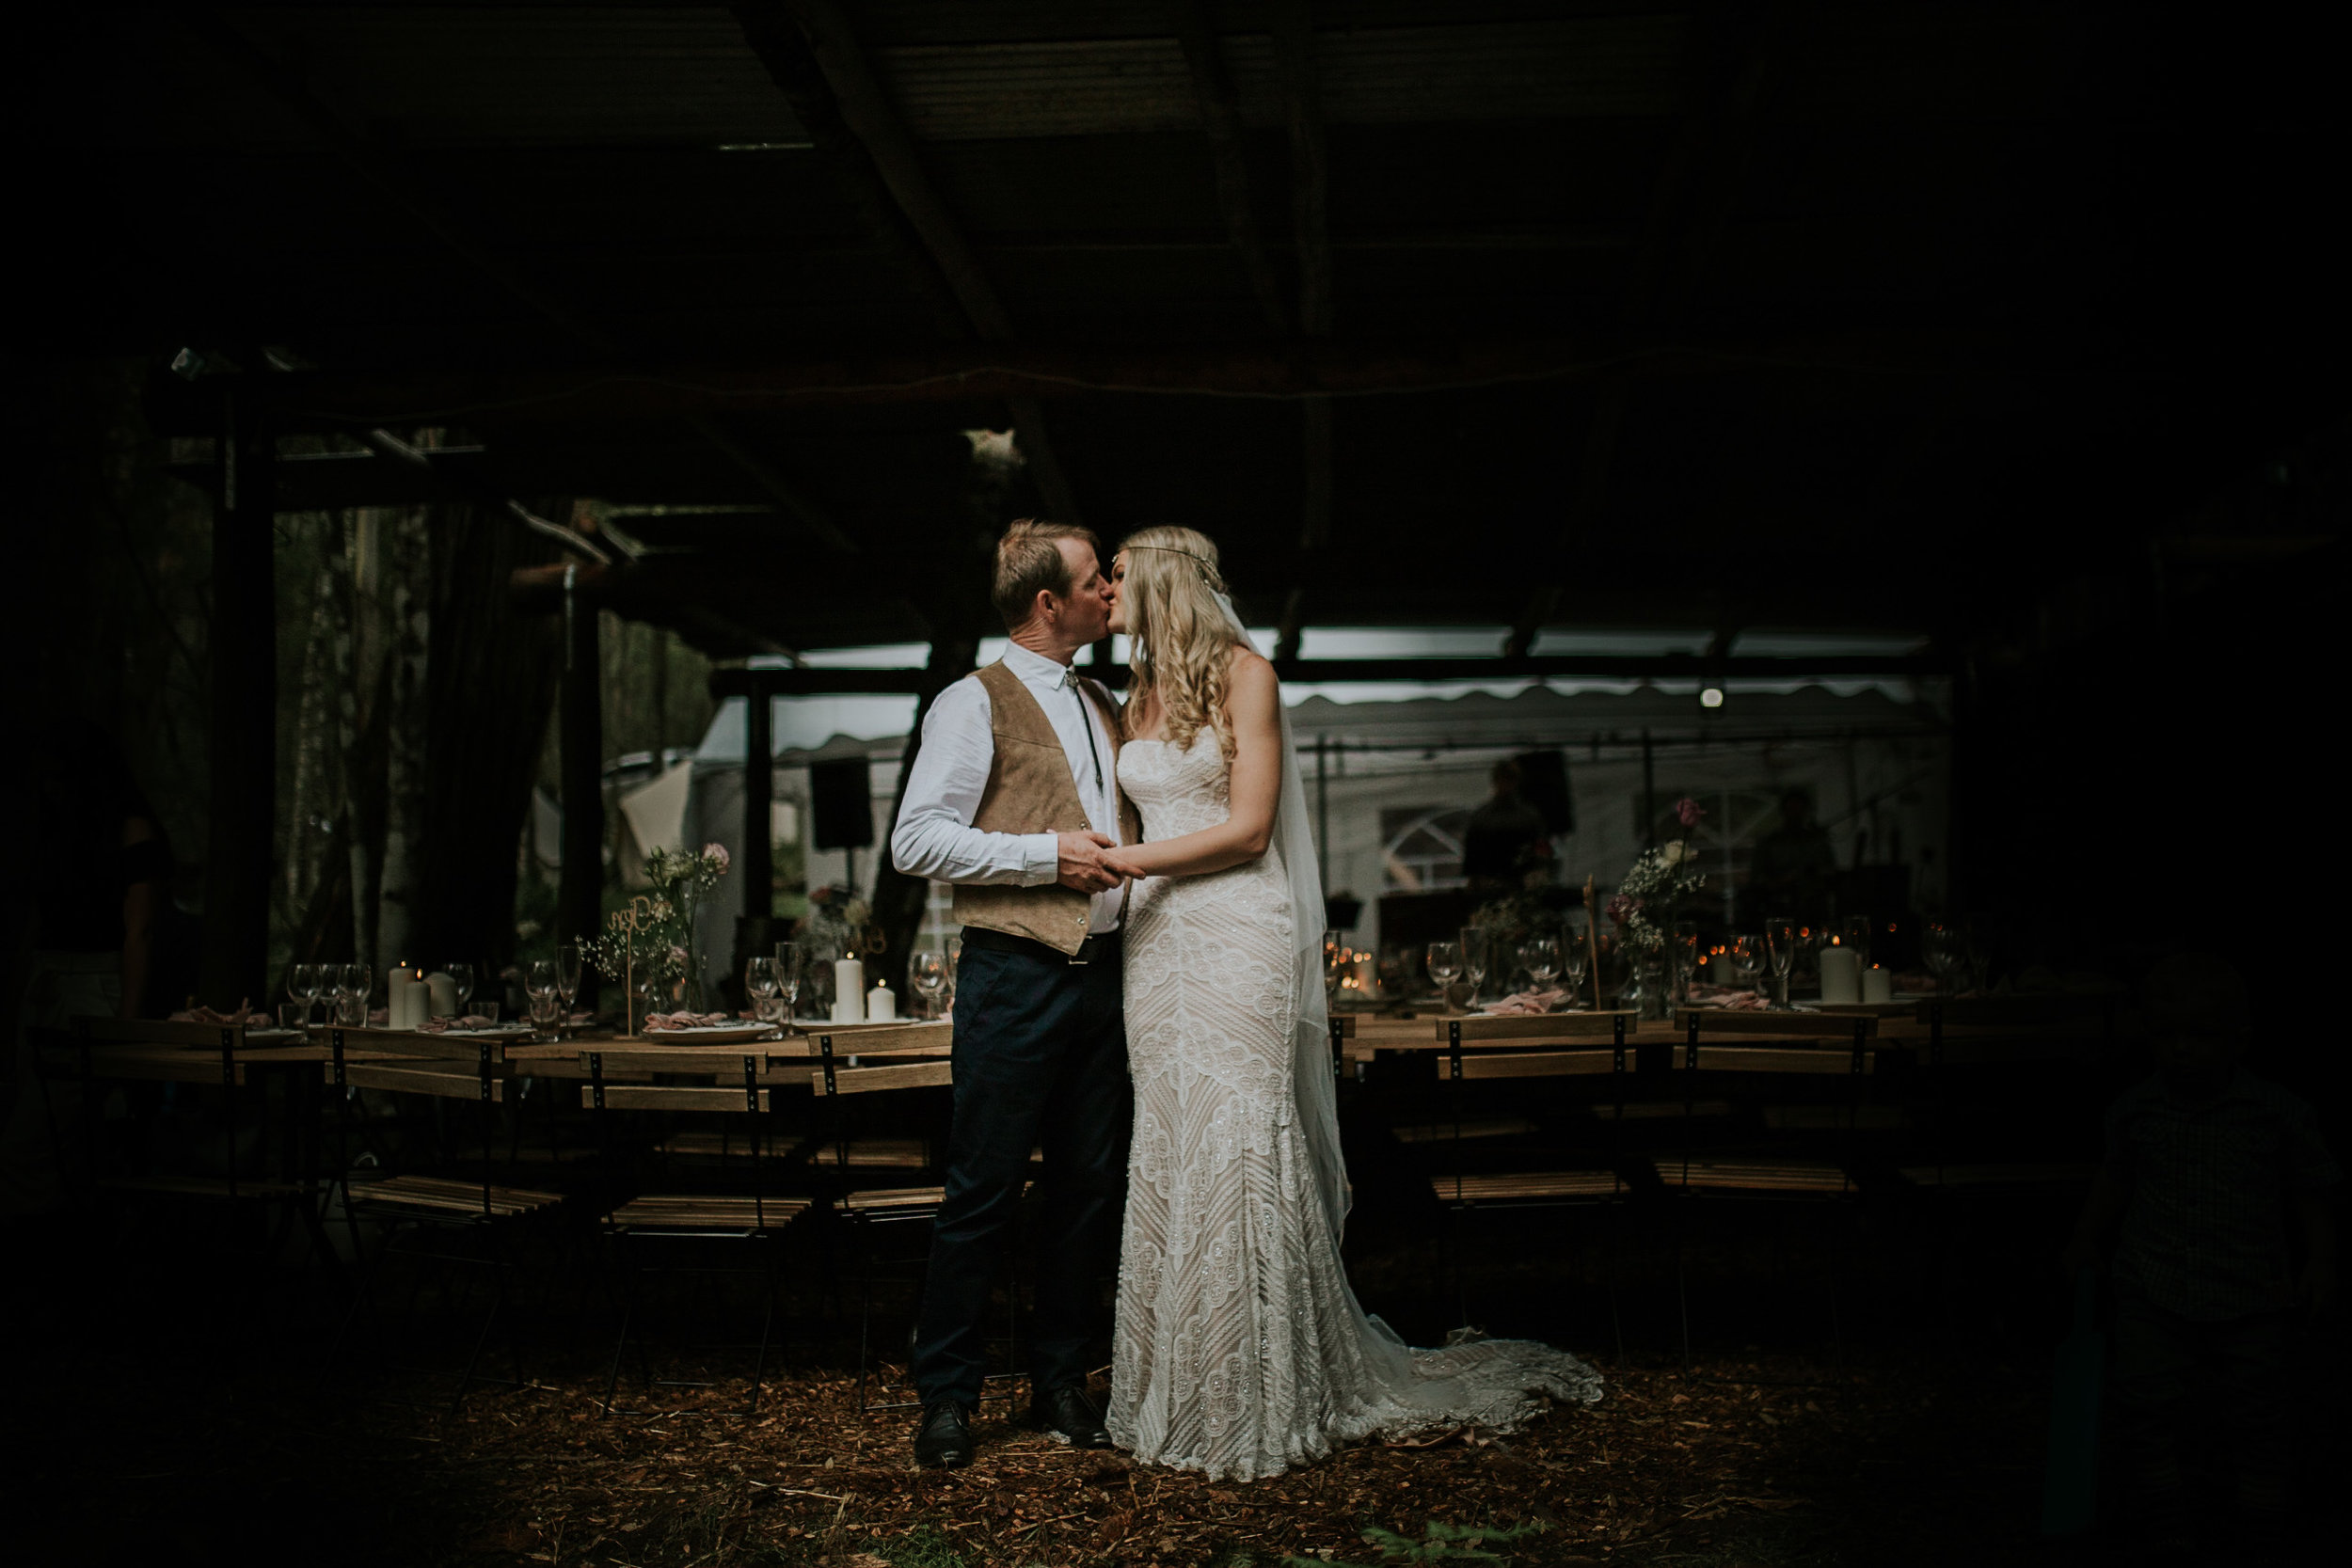 Emma + John - Runnyford, NSW wedding festiva;